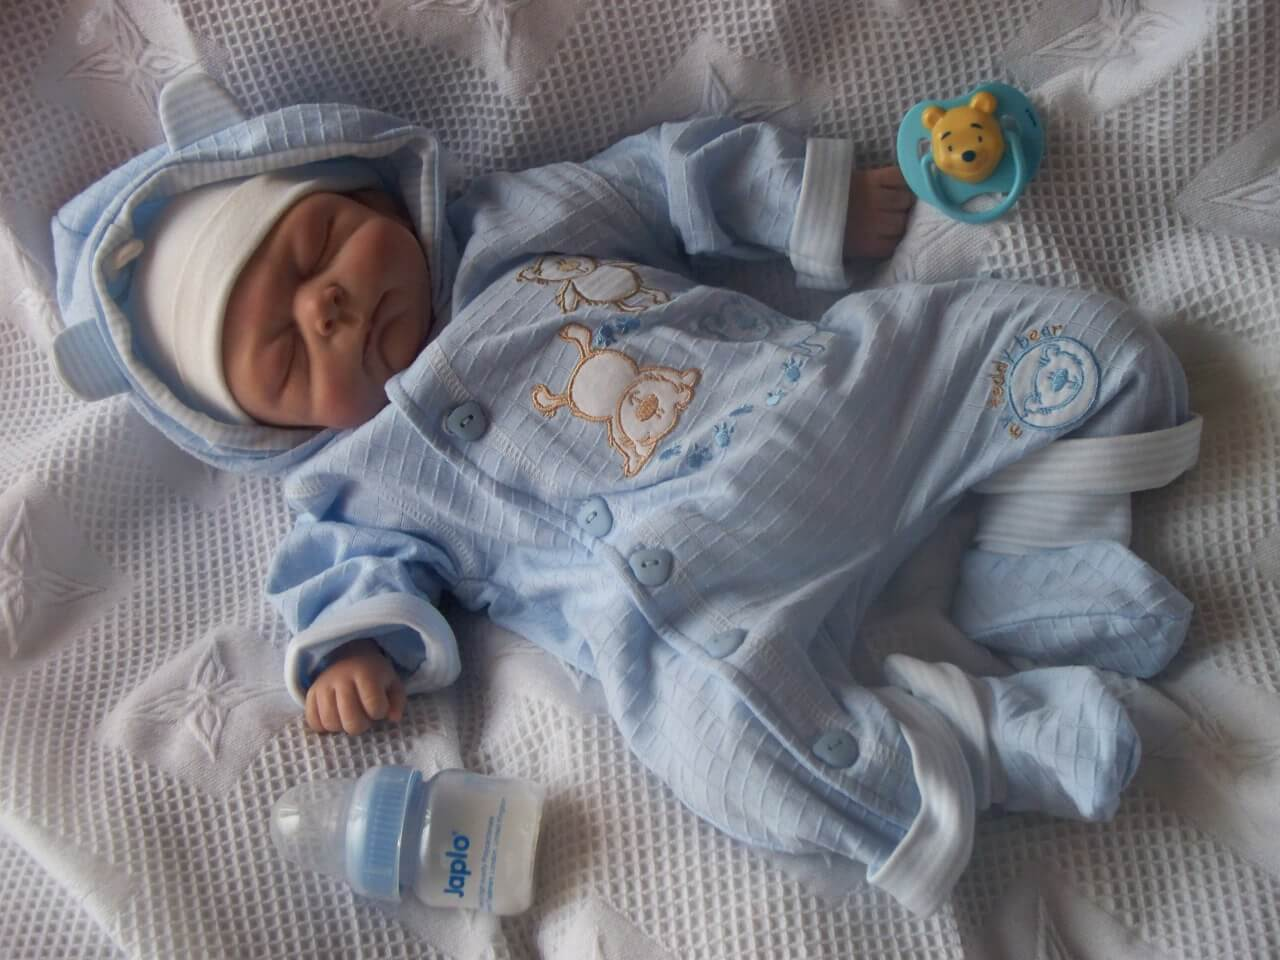 4 tips to bundle up a newborn